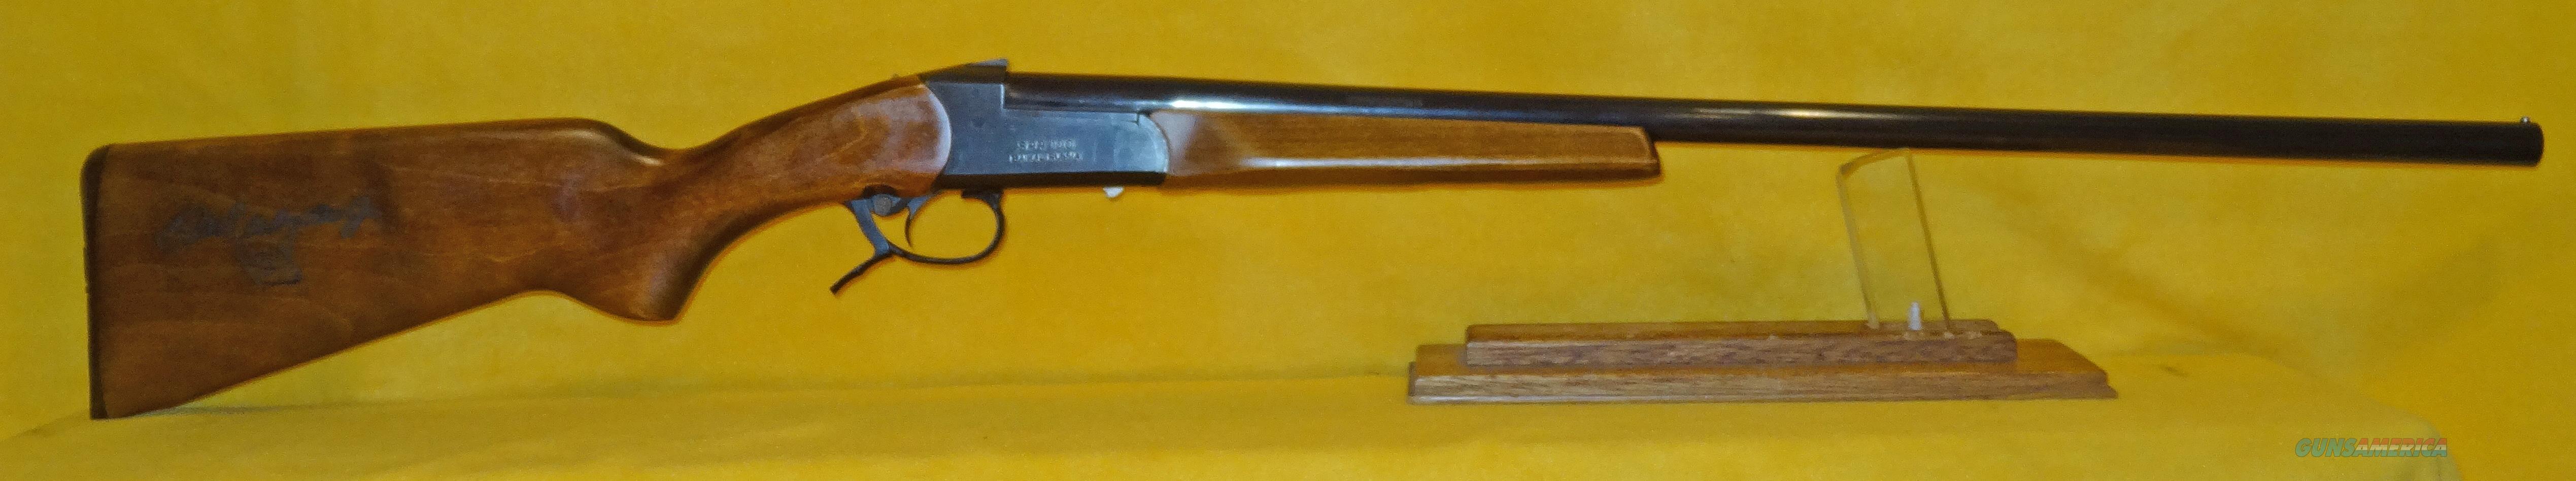 REMINGTON (SPARTAN) SPR100 (DALE EARNHARDT JR)  Guns > Shotguns > Remington Shotguns  > Single Barrel